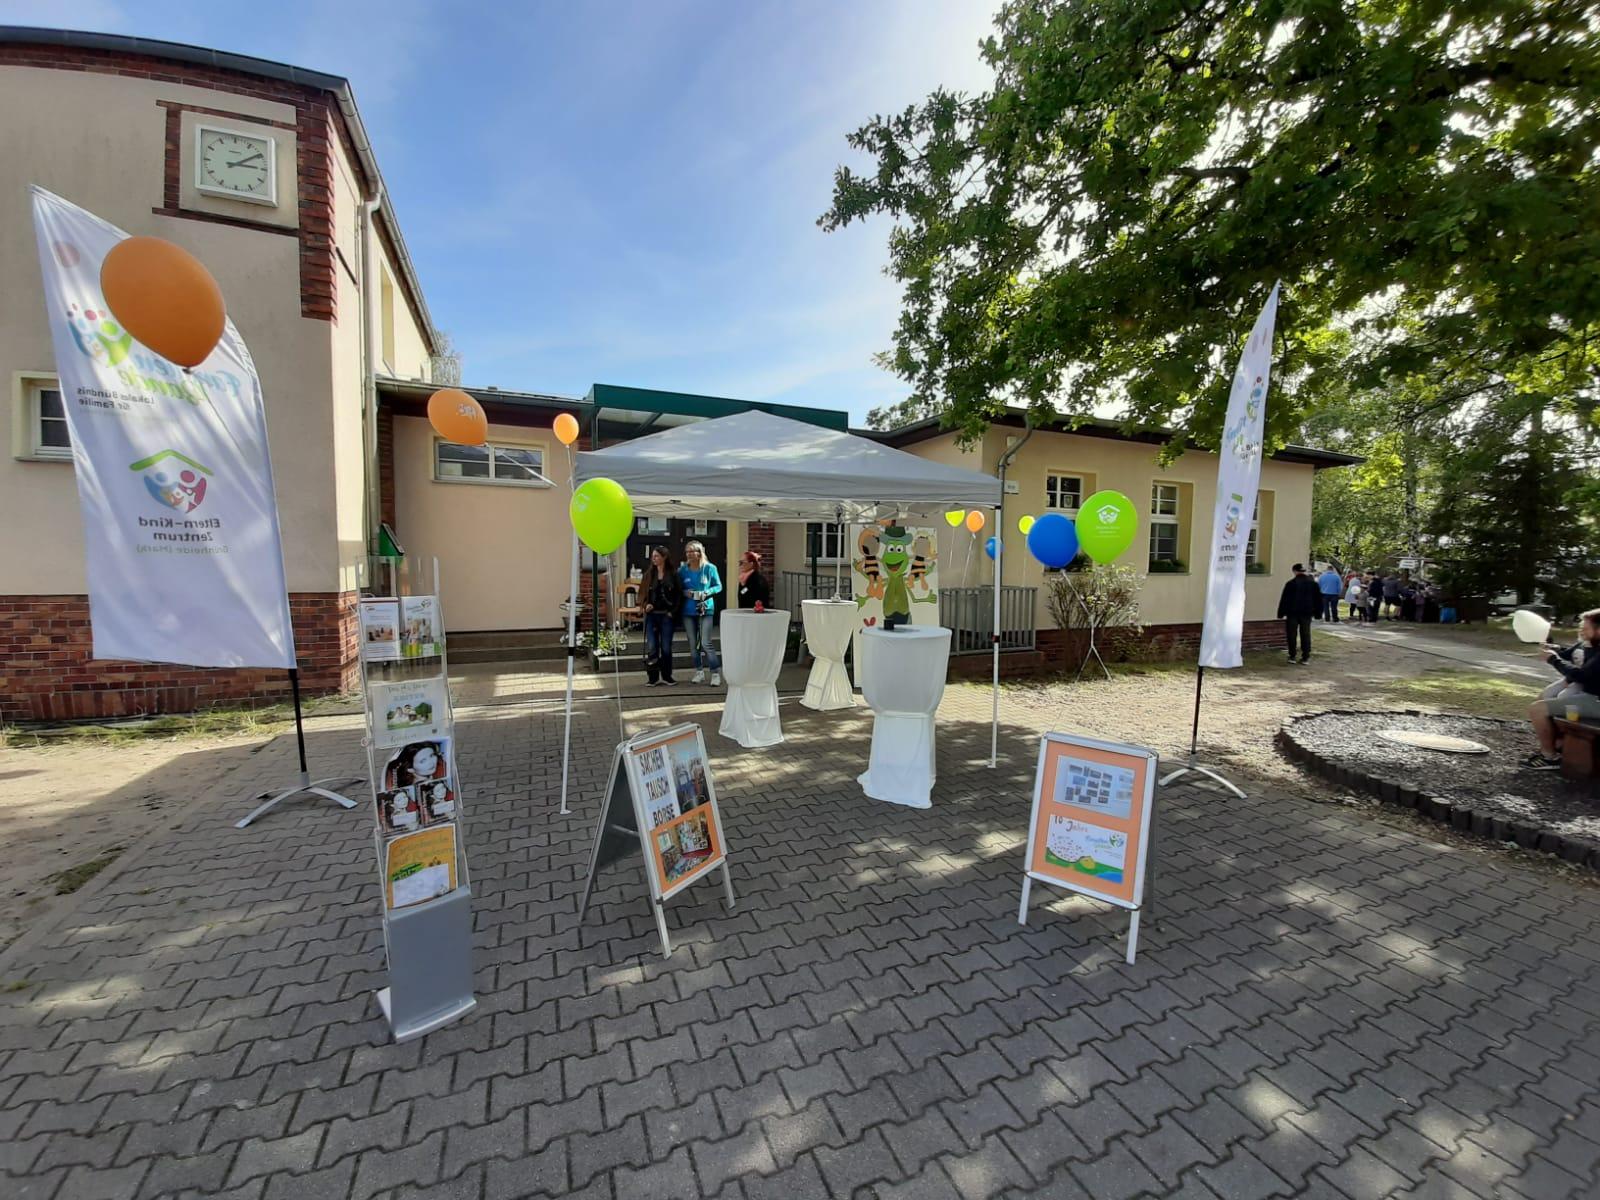 Familienzentrum Grünheide